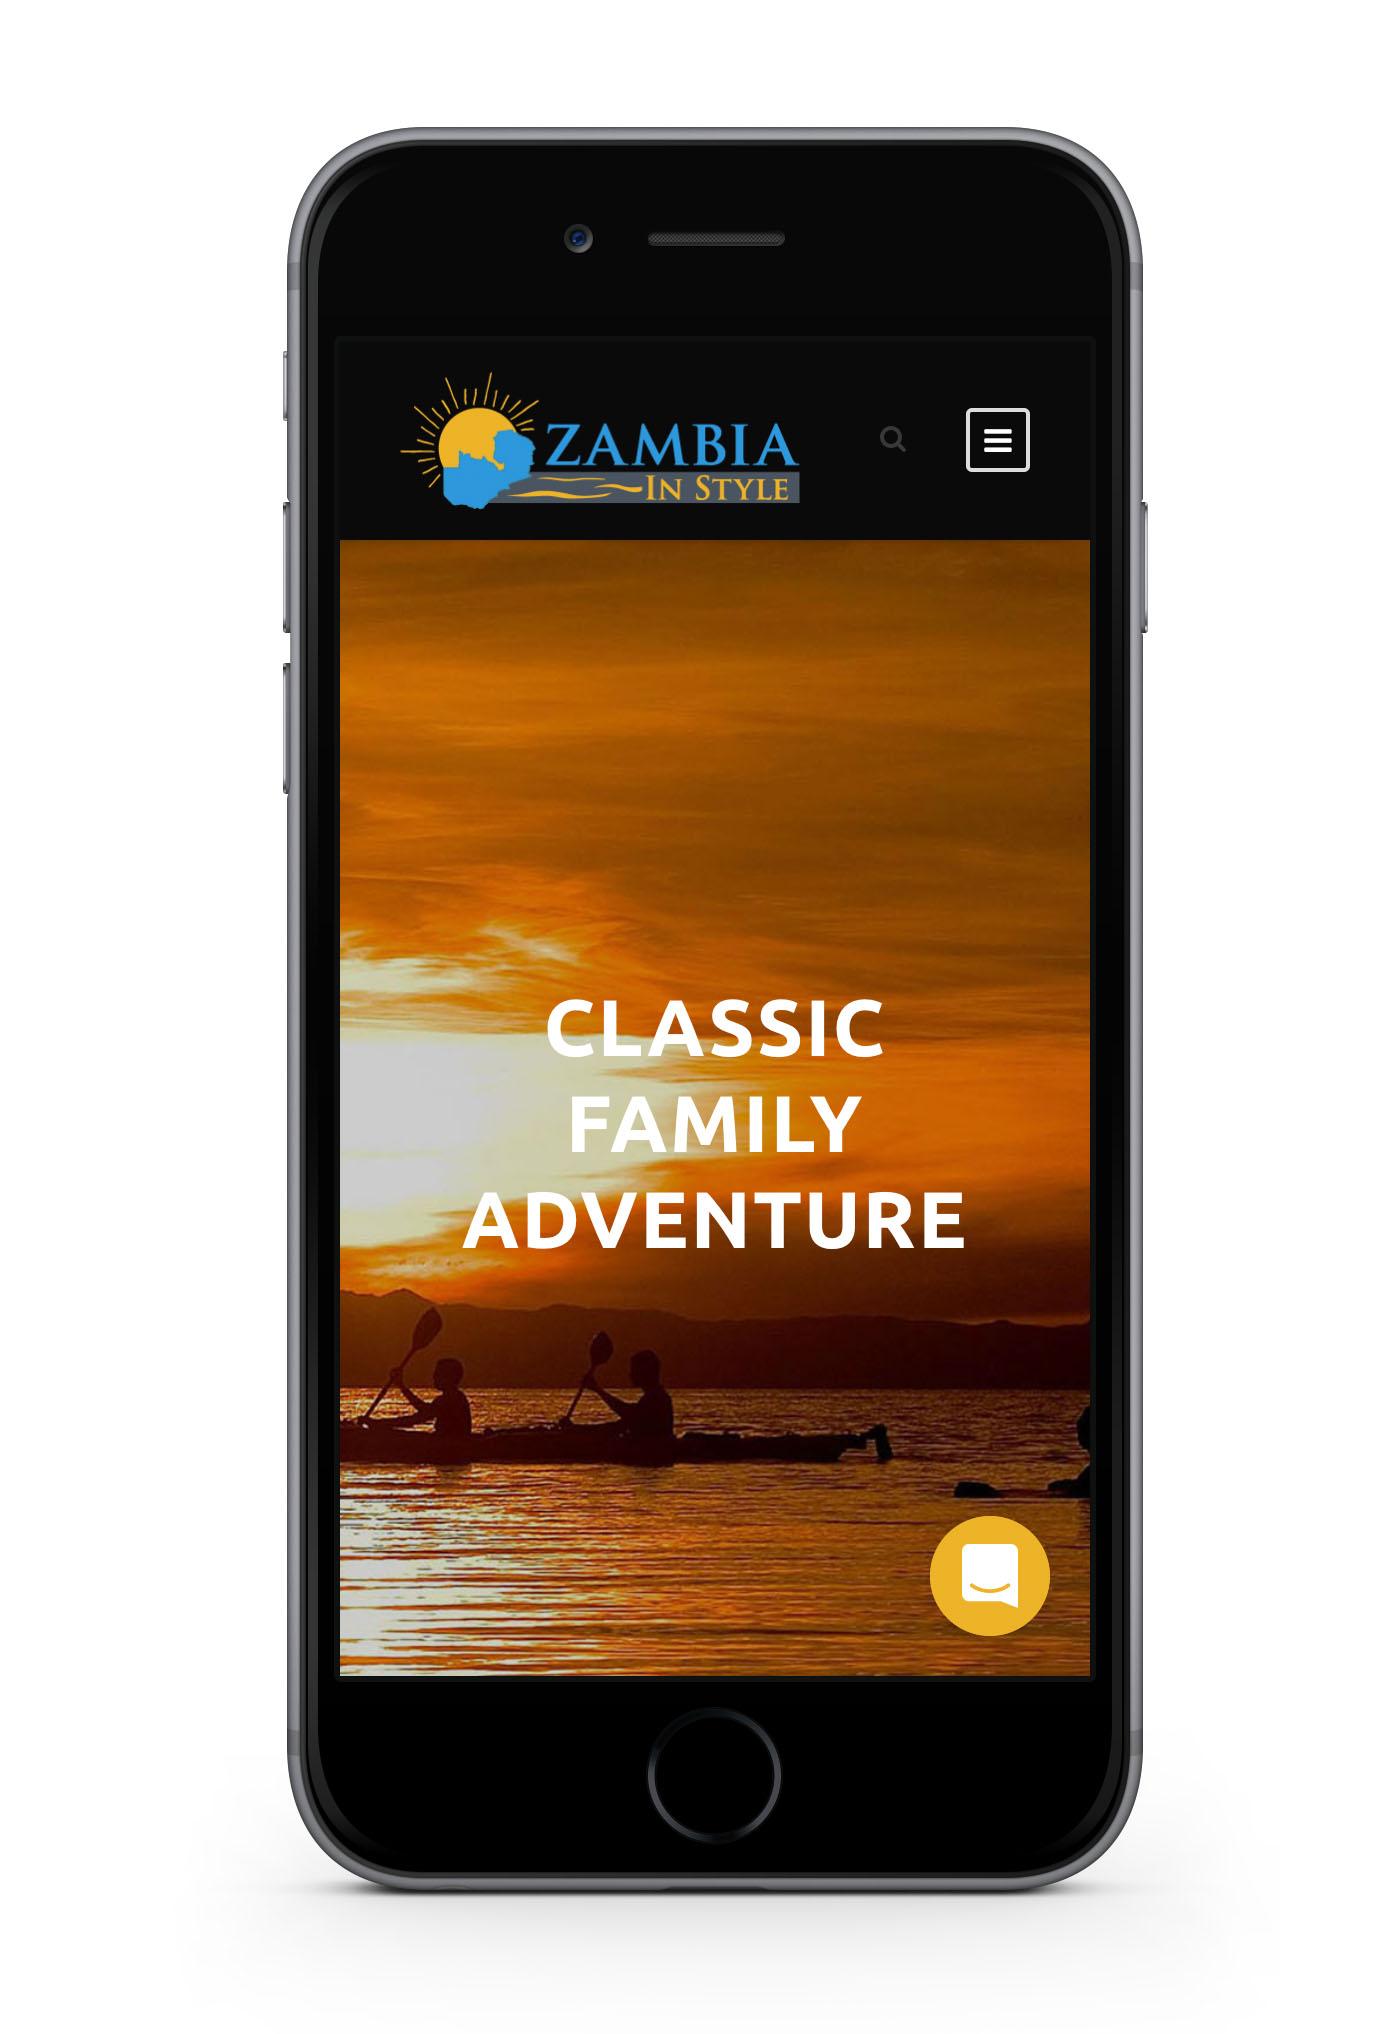 zambia in style web-design-portfolio-webdoor-responsive-web-design-agency-hillcrest-kwazulu-natal-phone